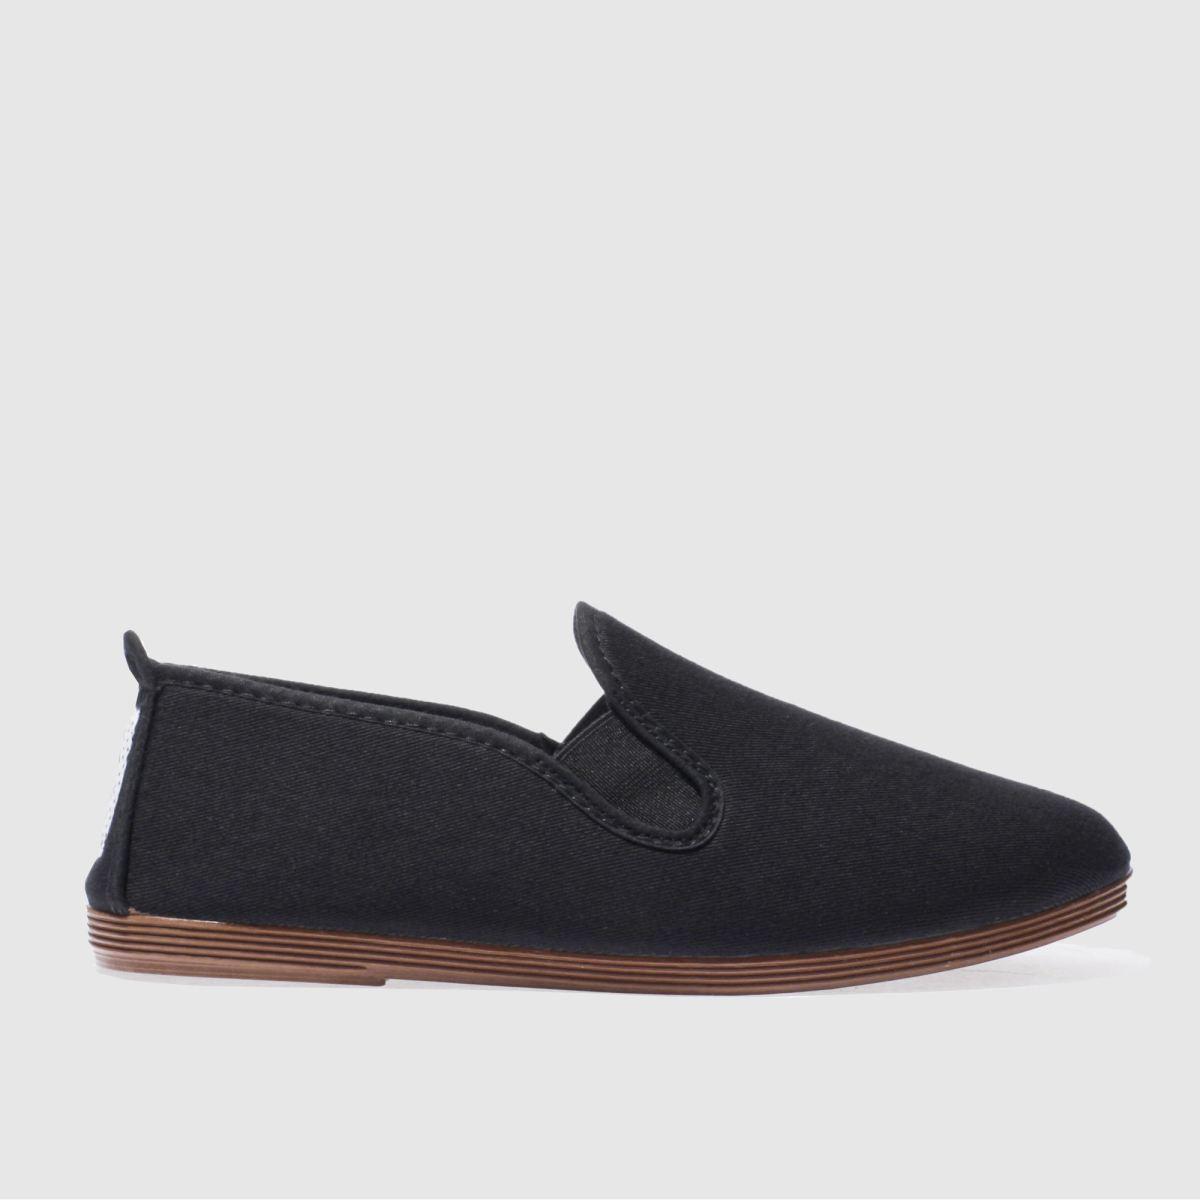 Flossy Flossy Black Plimsoll Flat Shoes